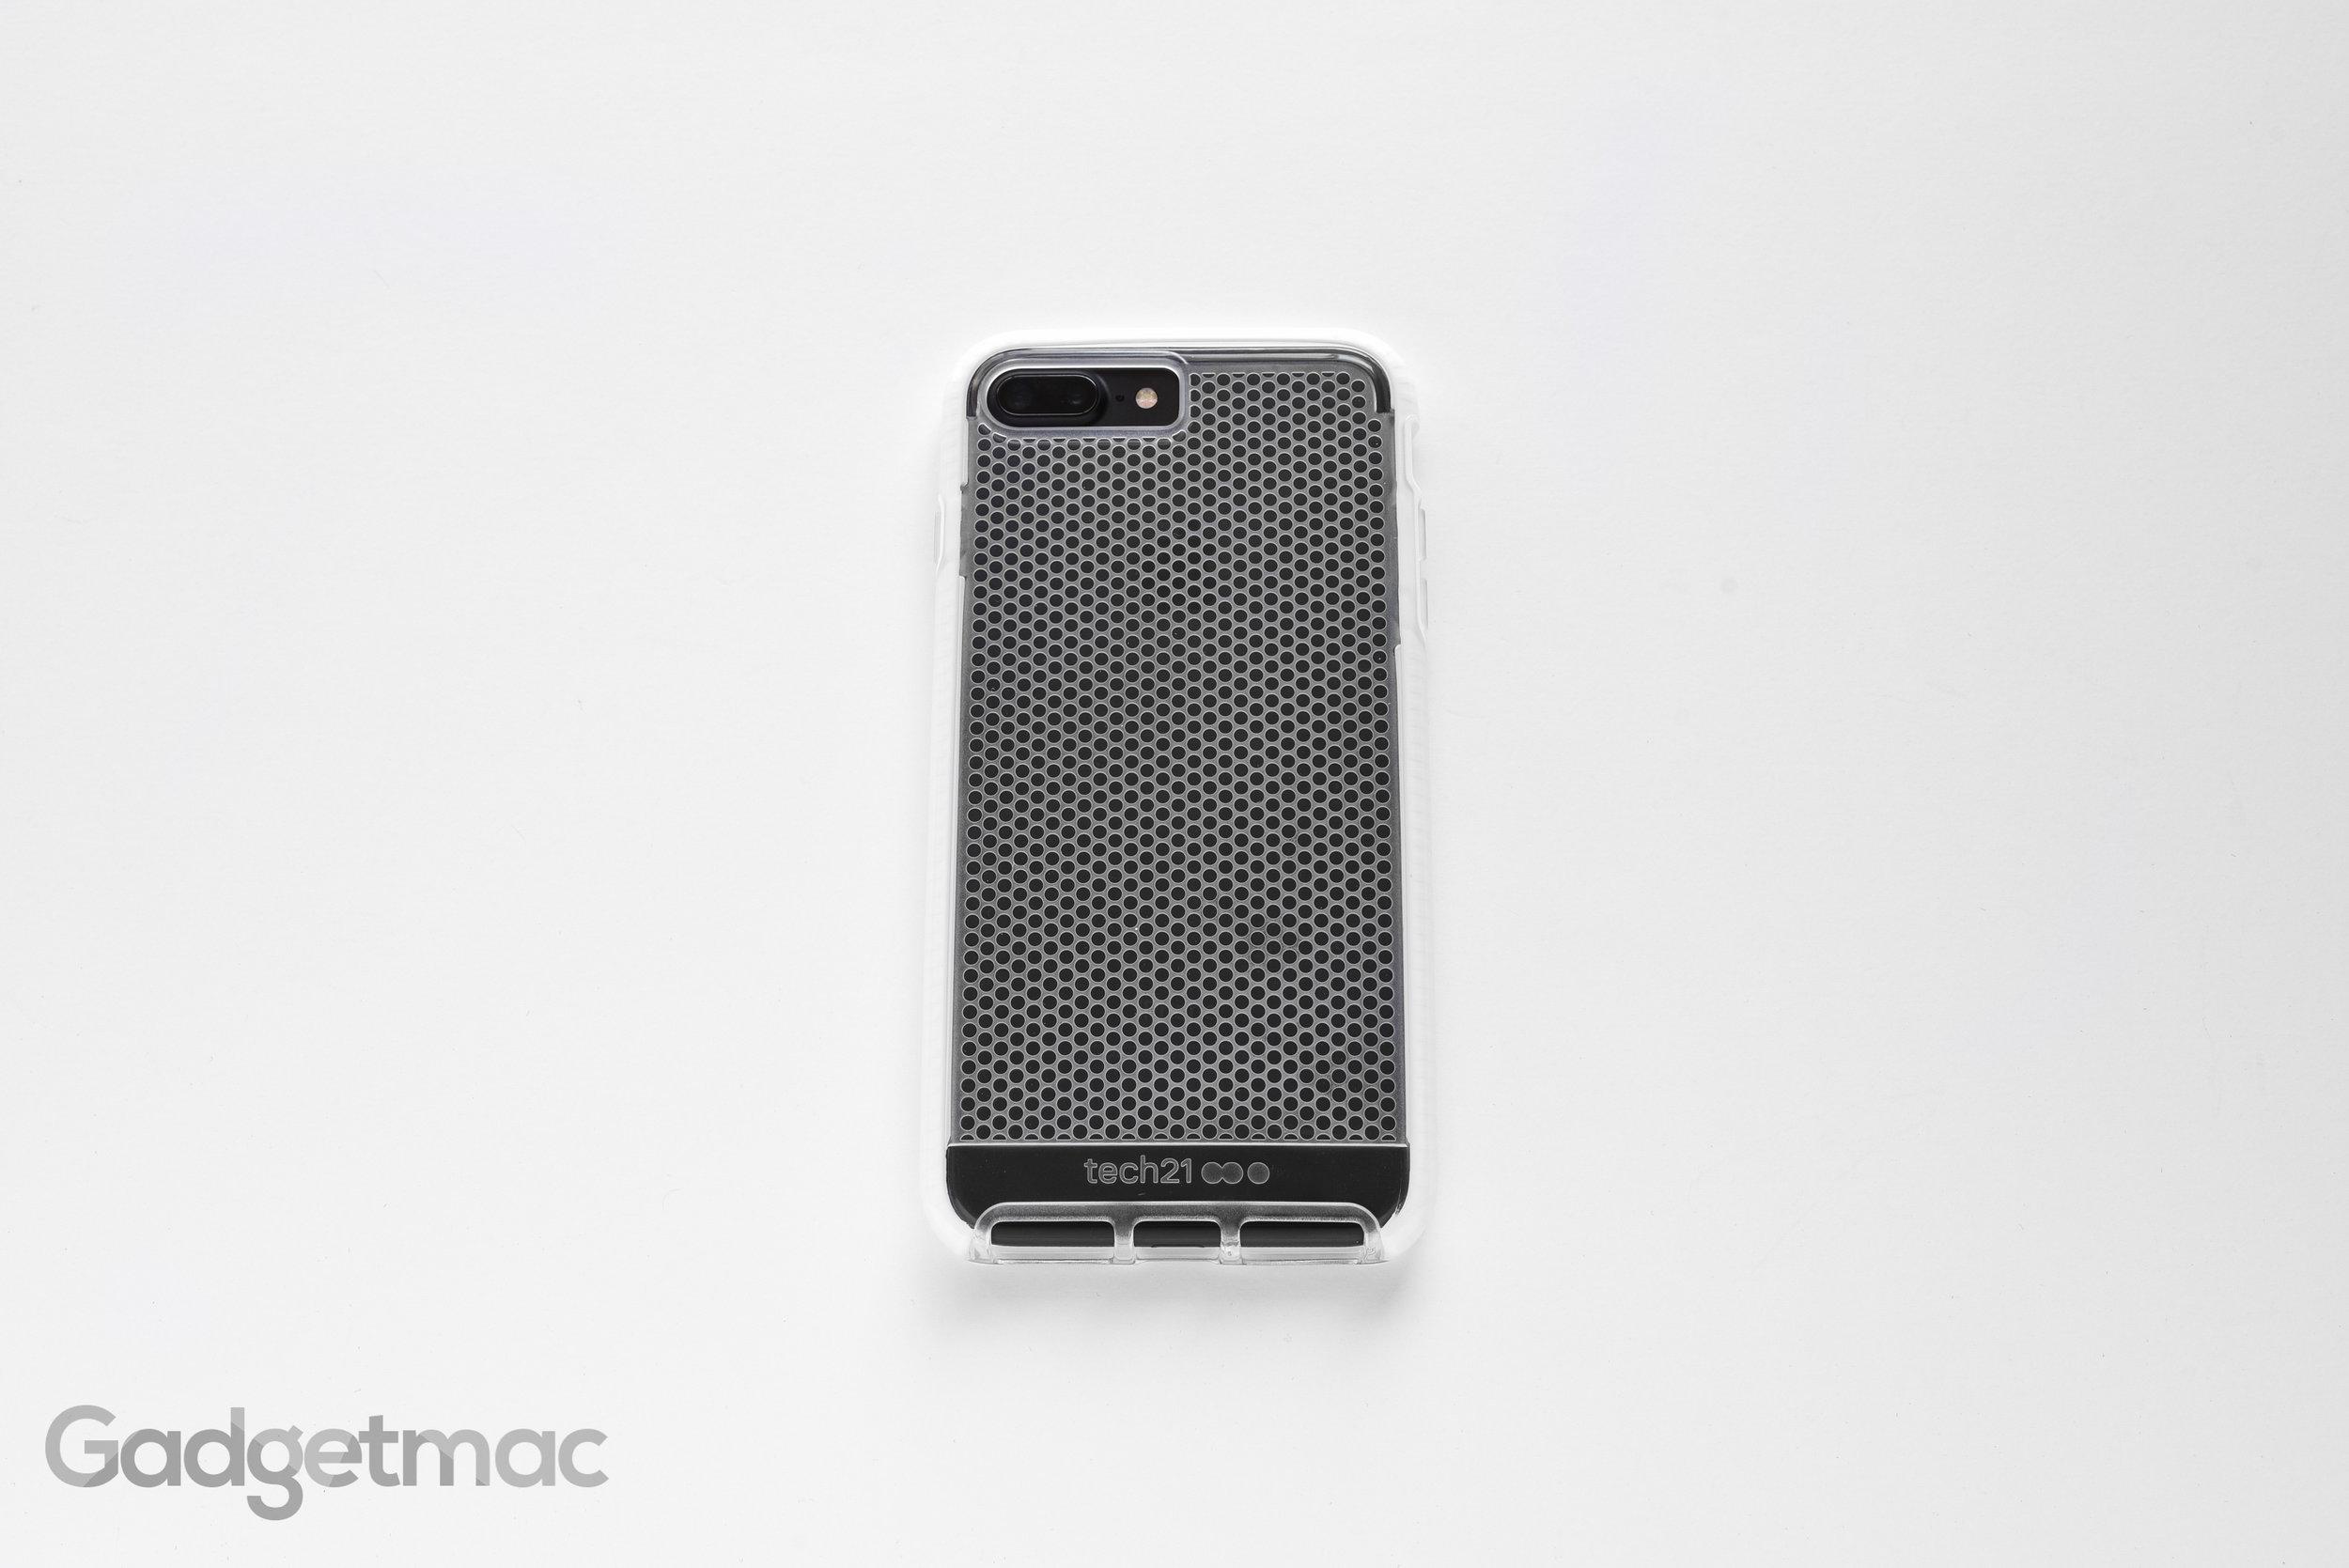 tech21-evo-mesh-iphone-7-plus-case.jpg